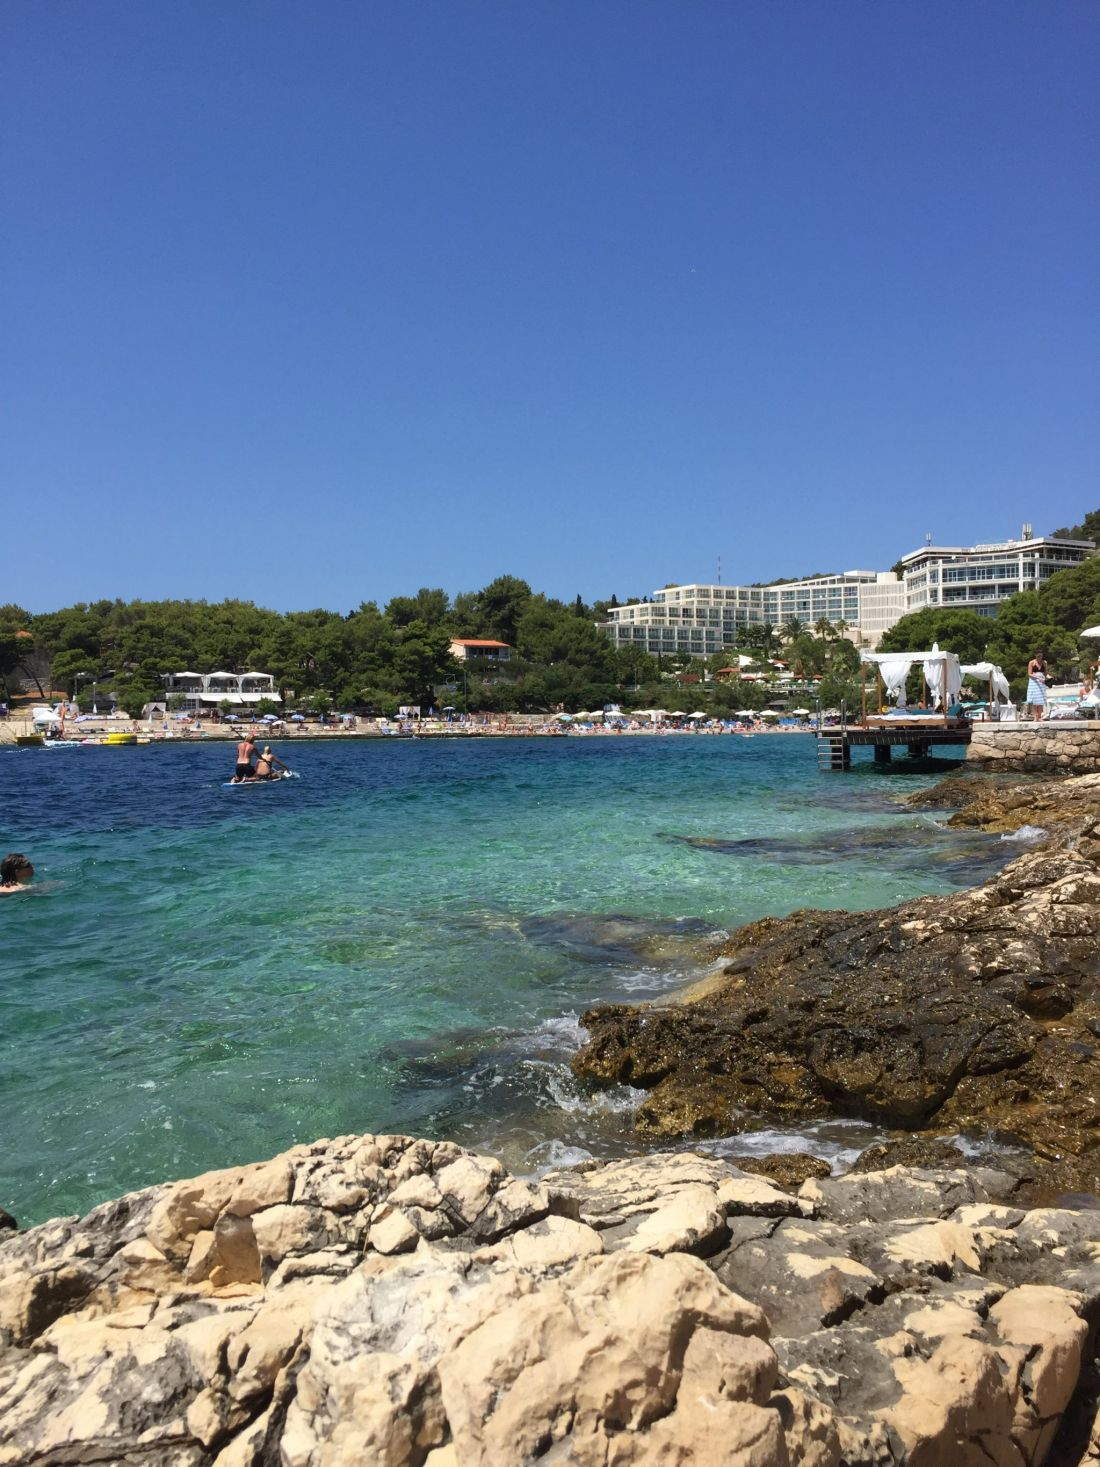 Sunbathing in Croatia